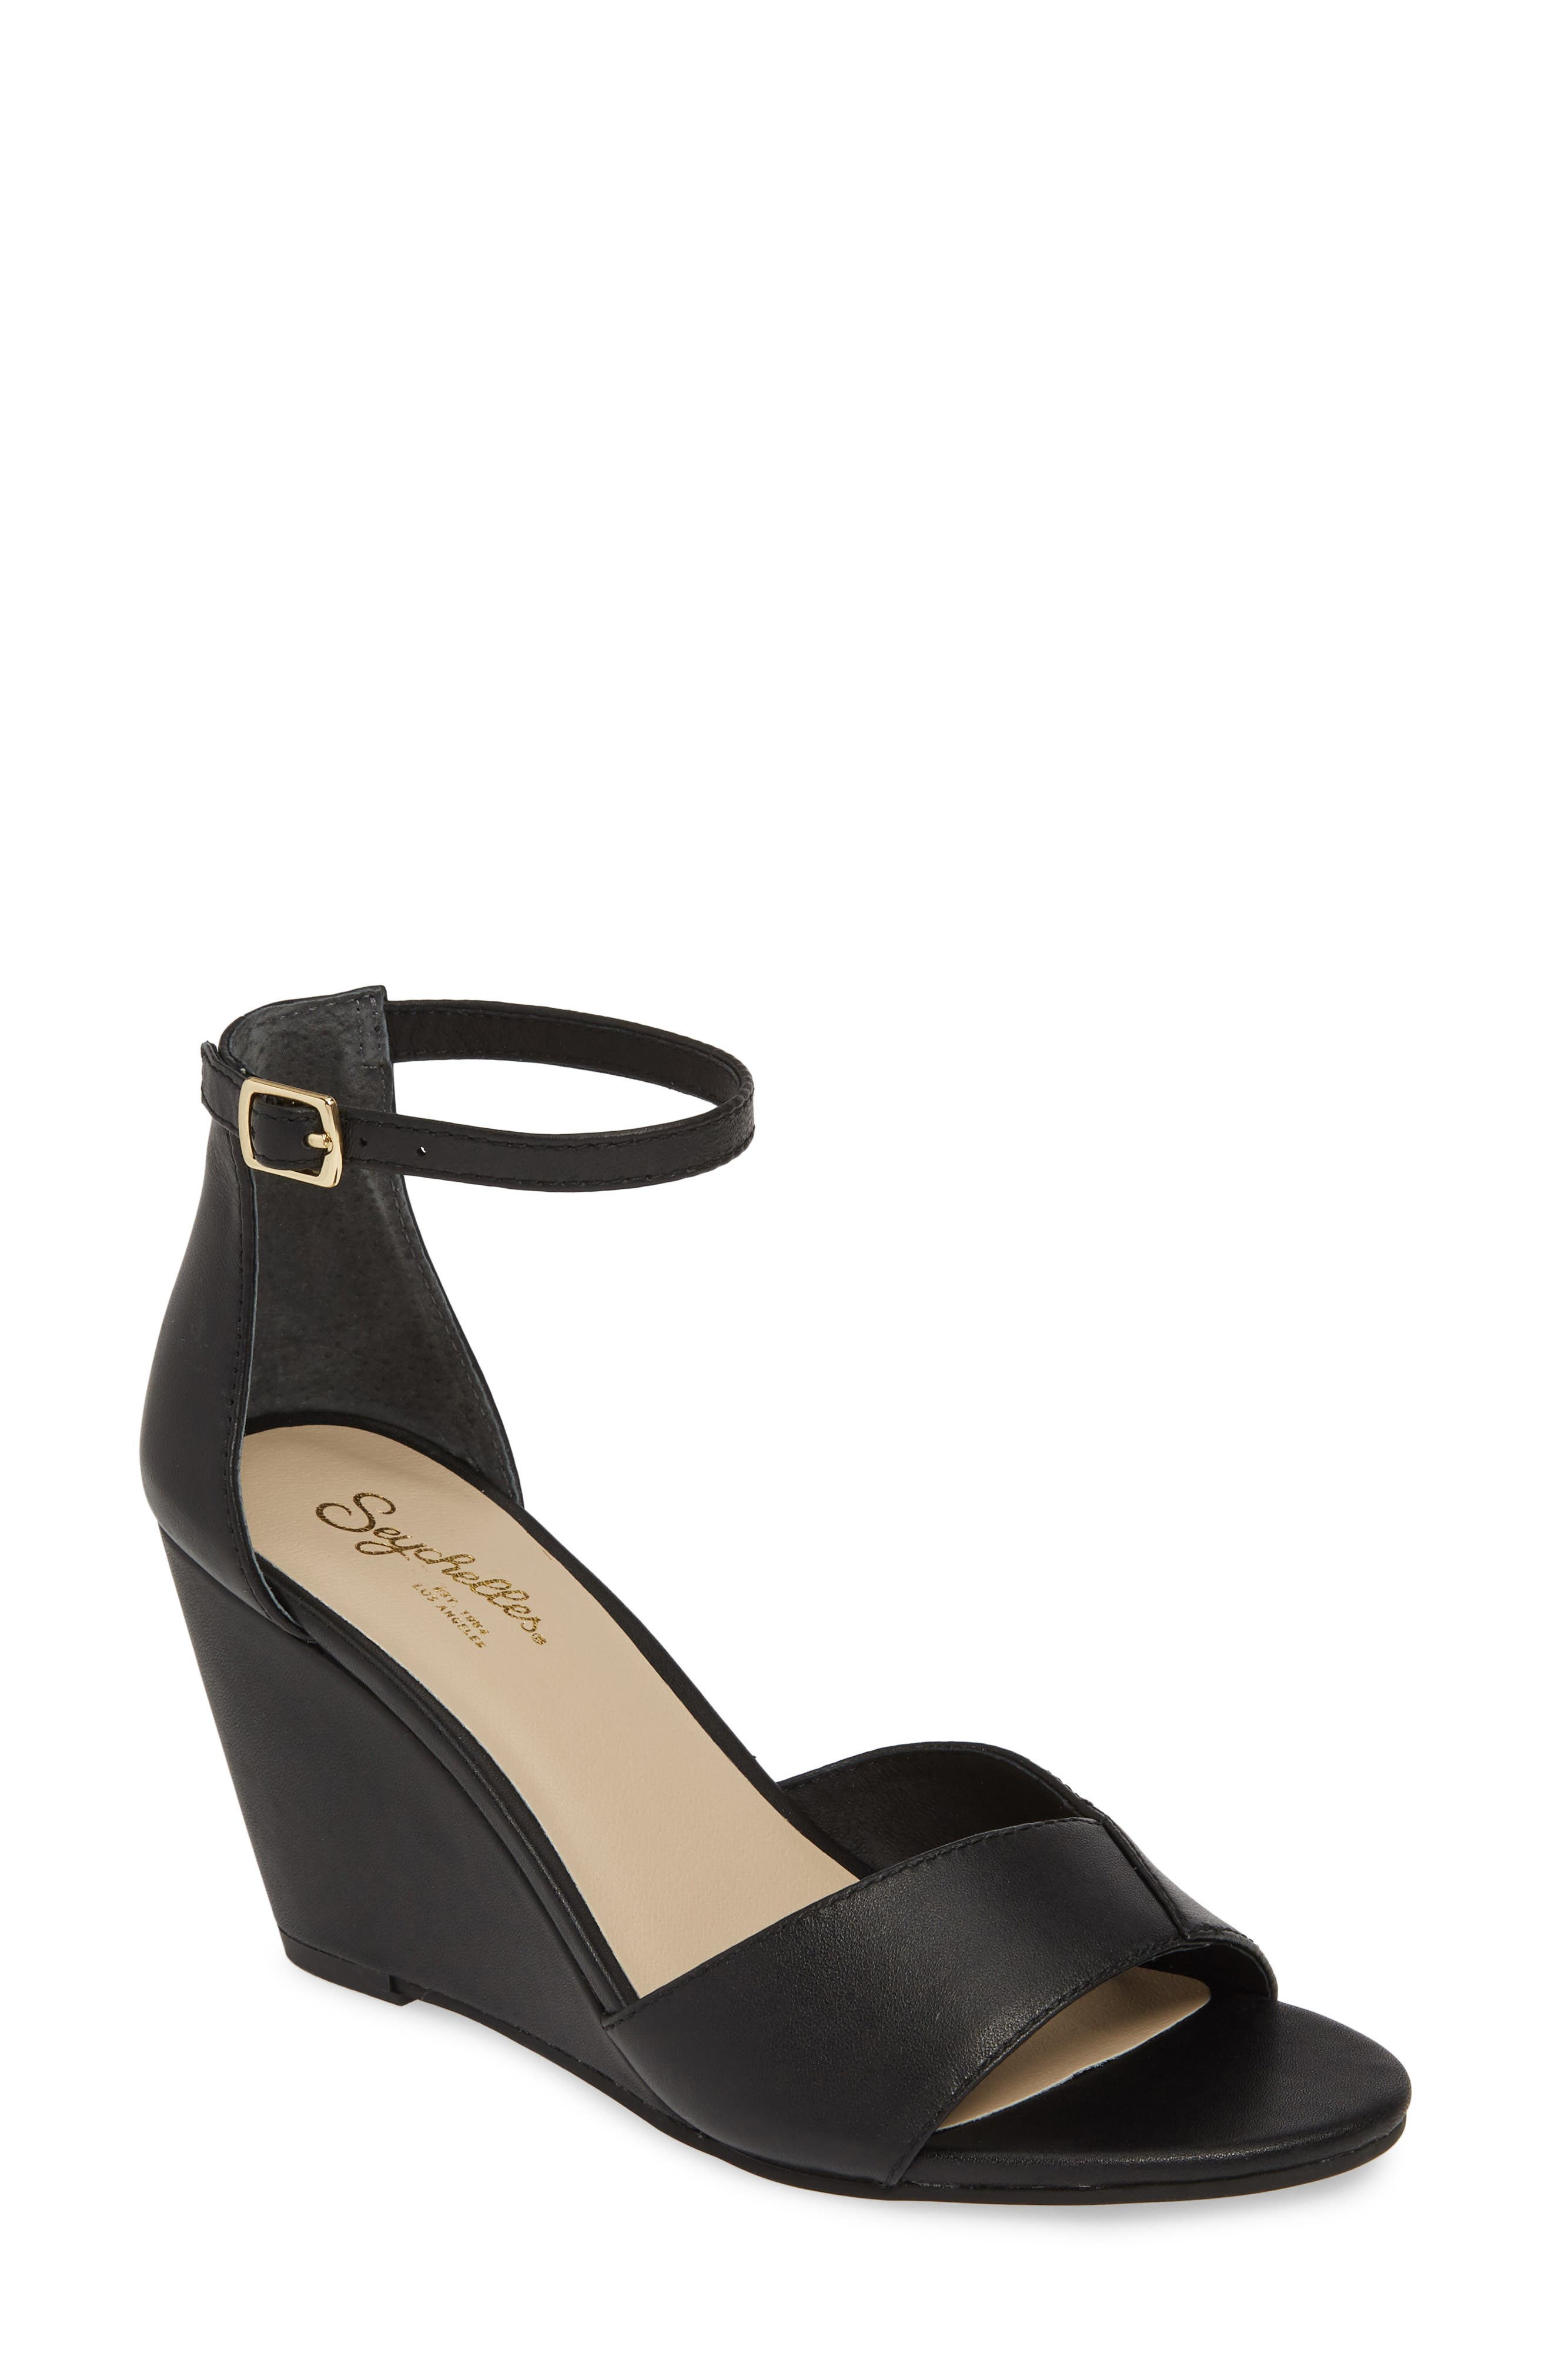 Seychelles Dual Purpose Wedge Ankle Strap Sandal, Black